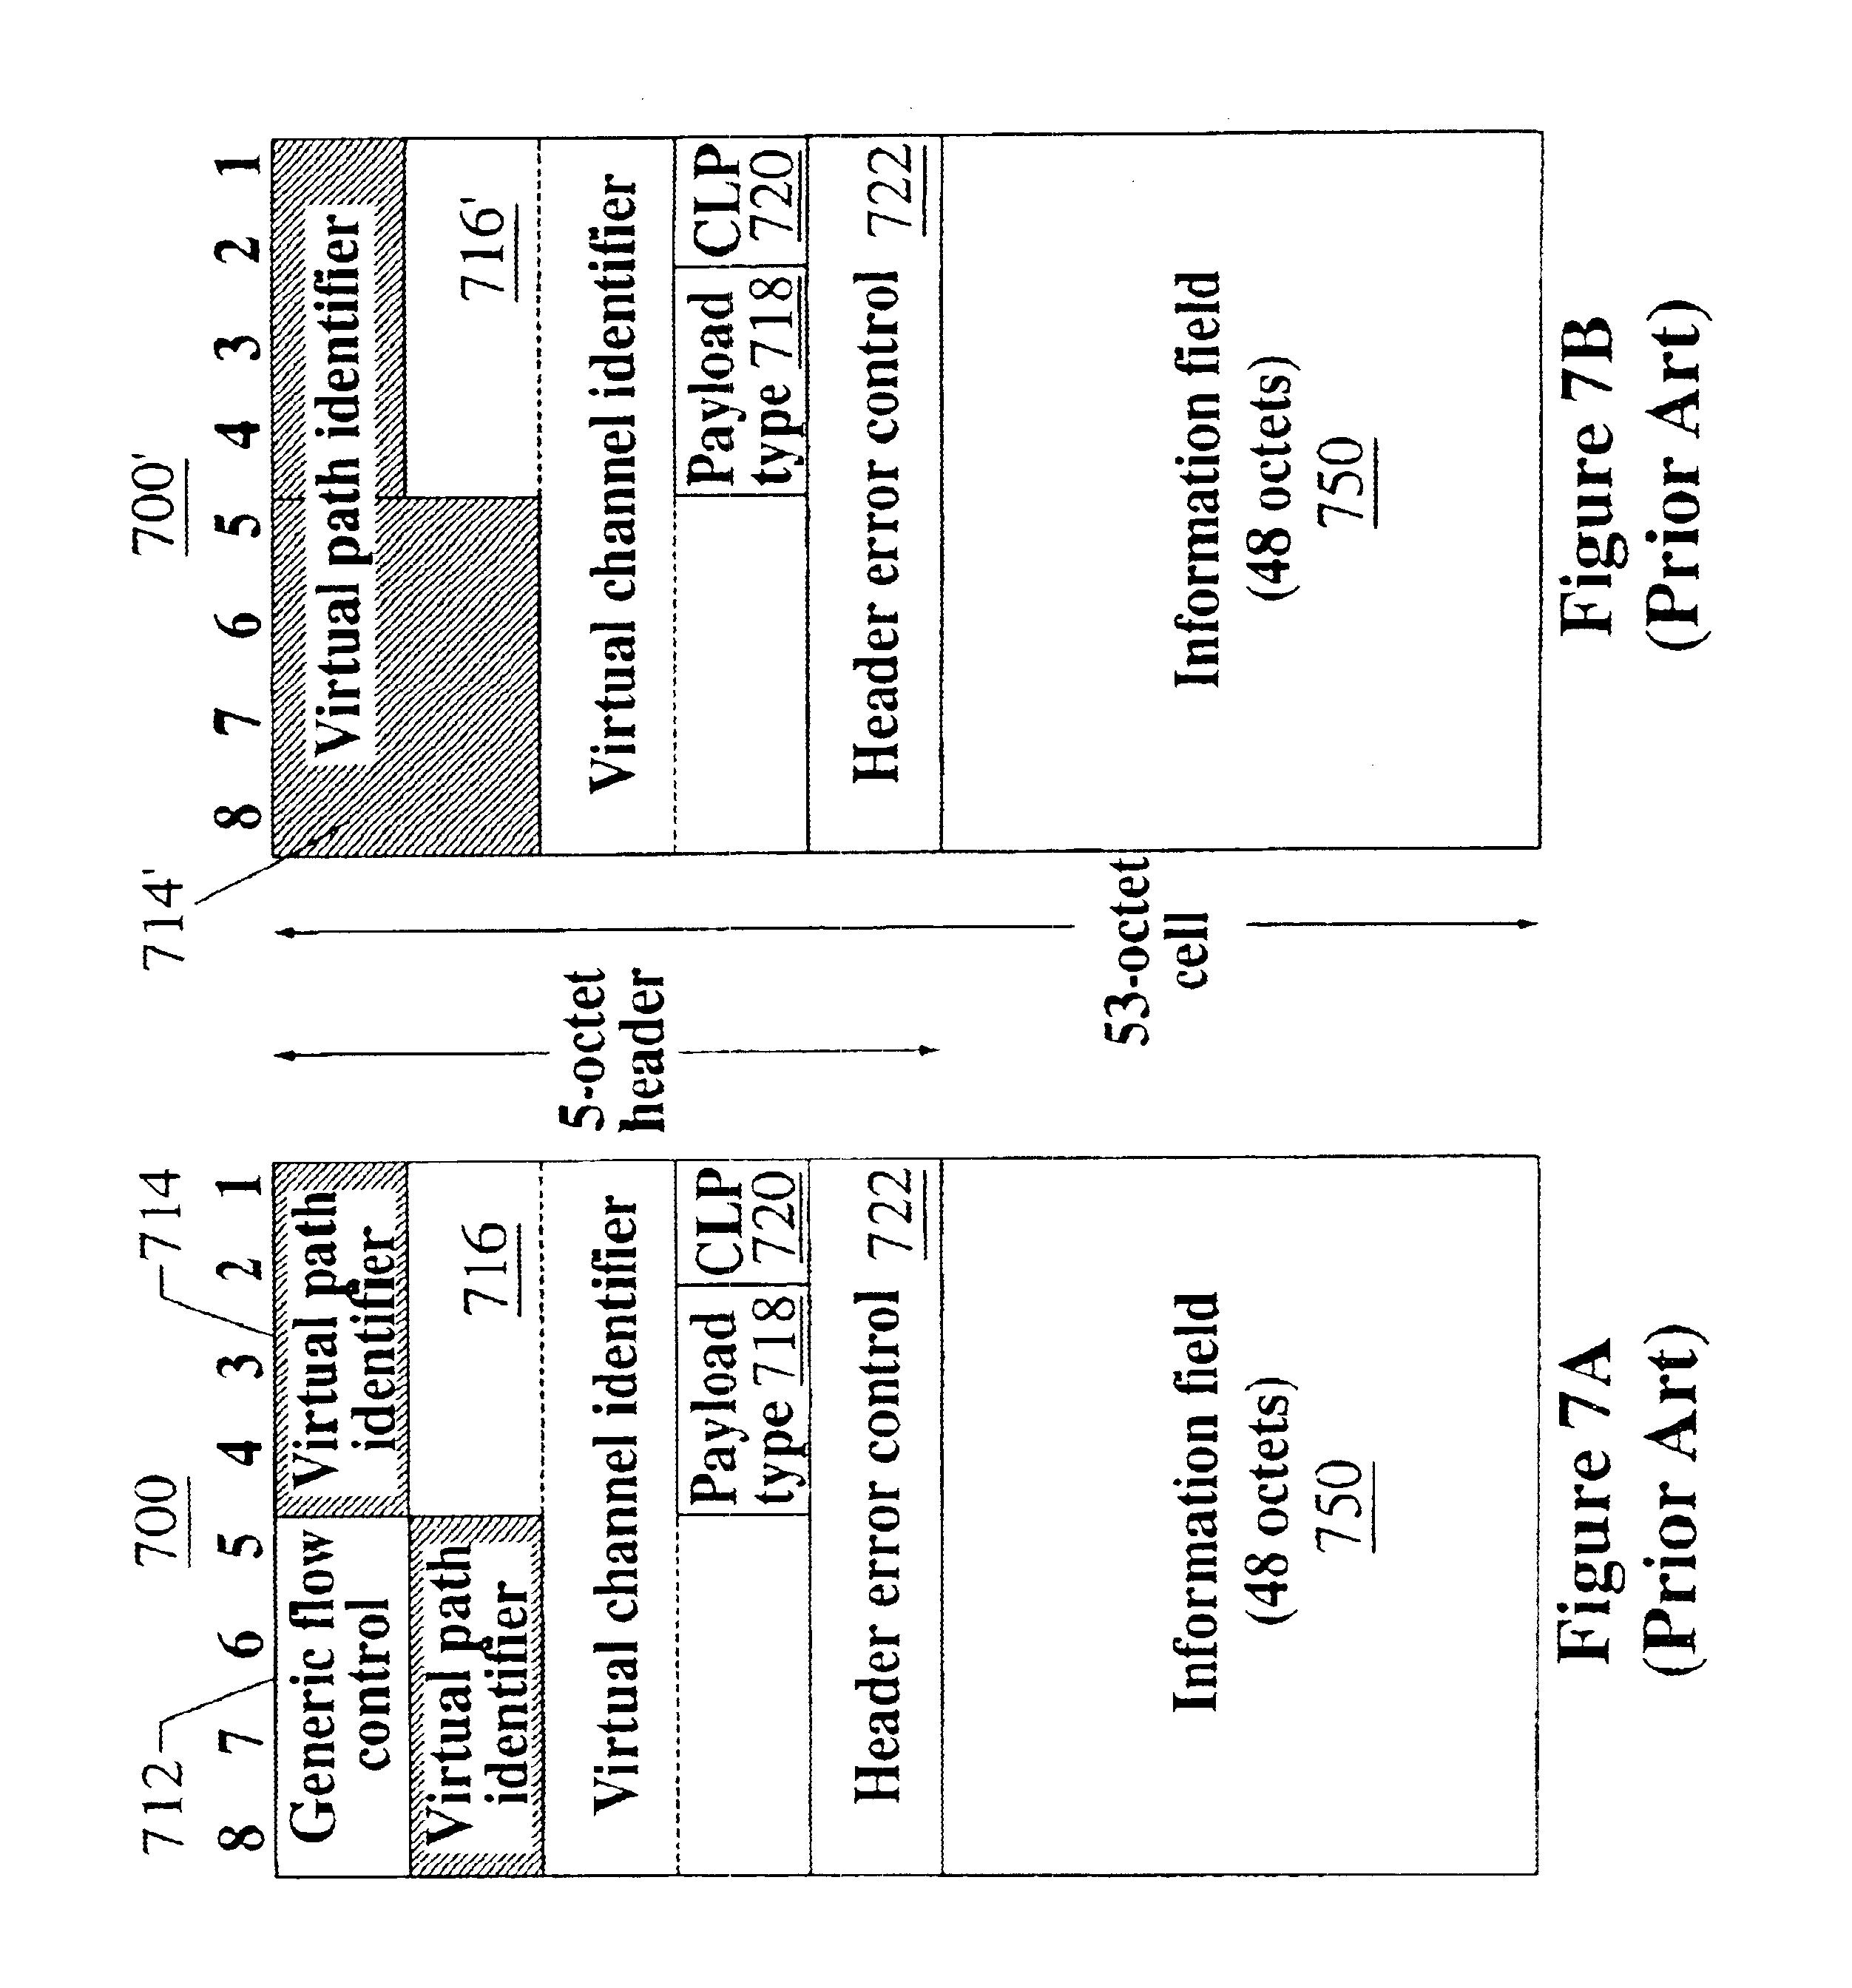 Patent US 6,667,984 B1